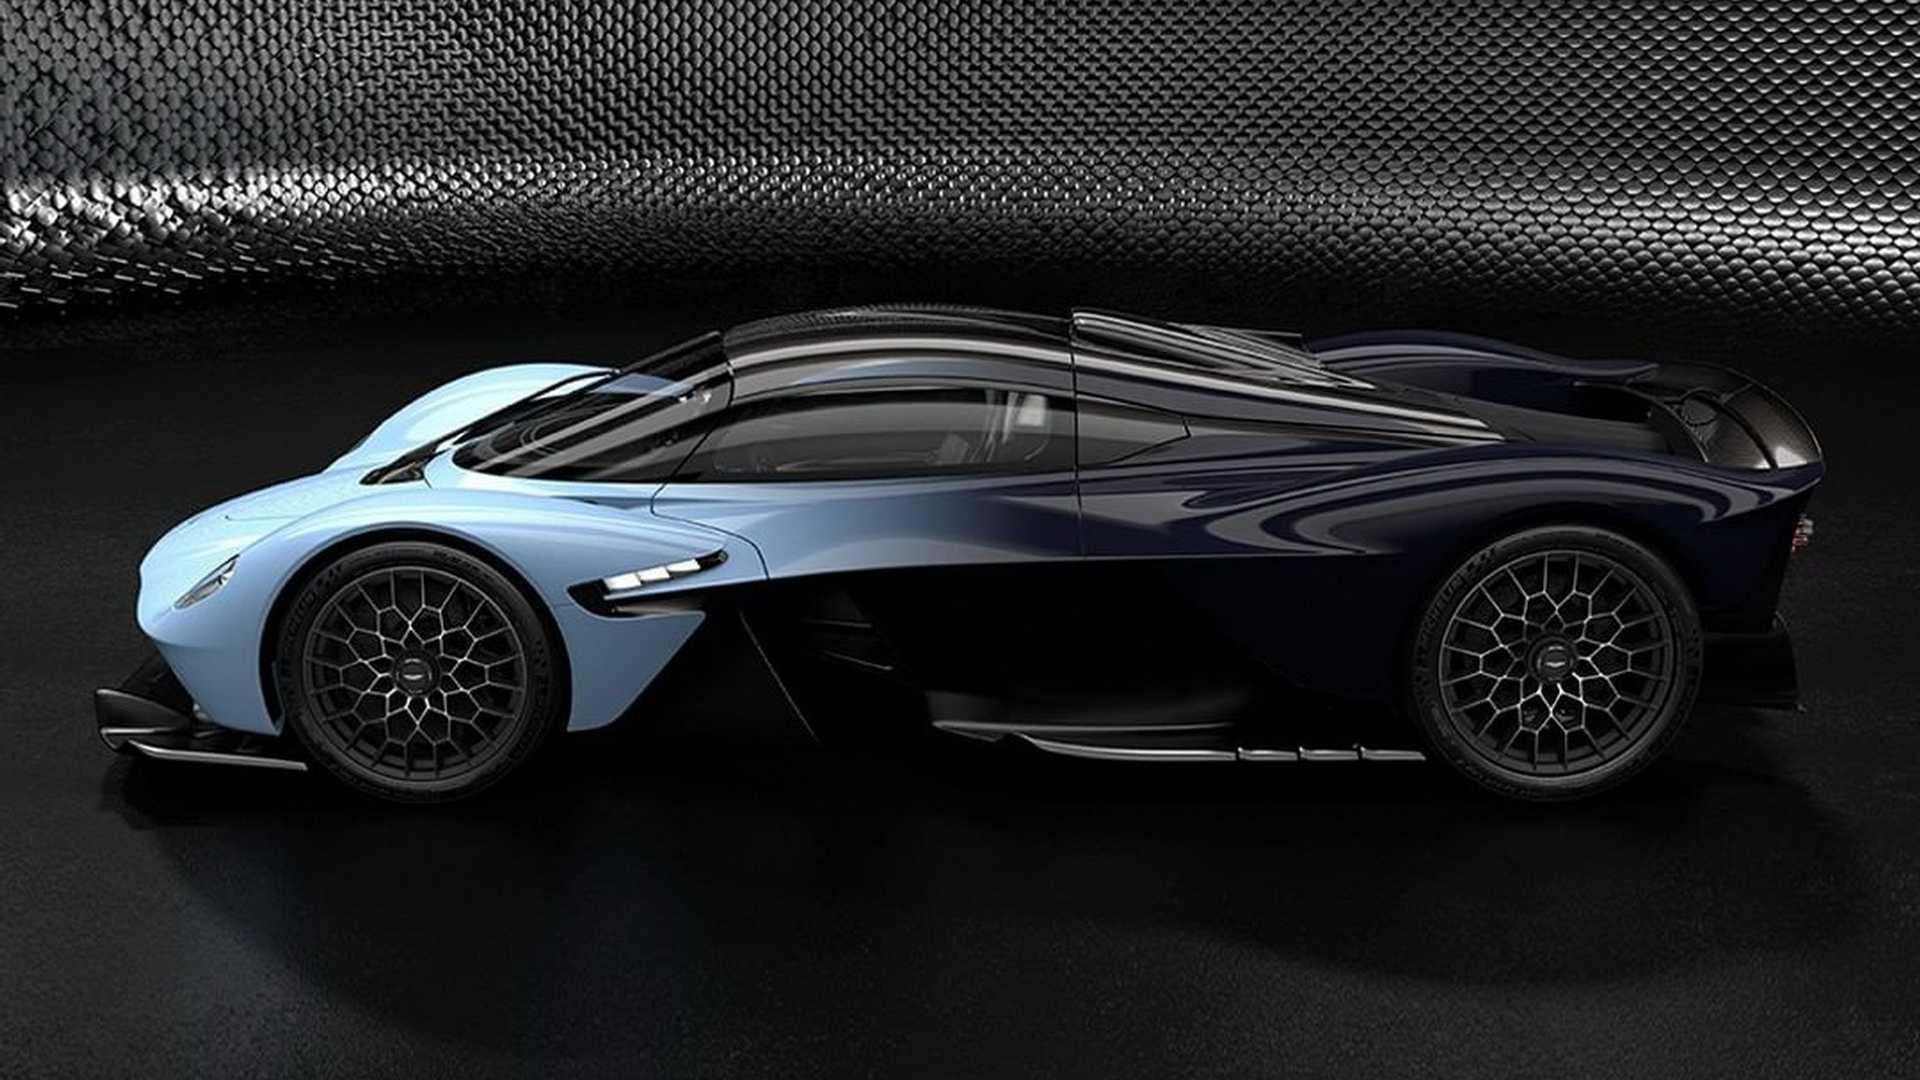 Aston Martin Valkyrie 1118 01